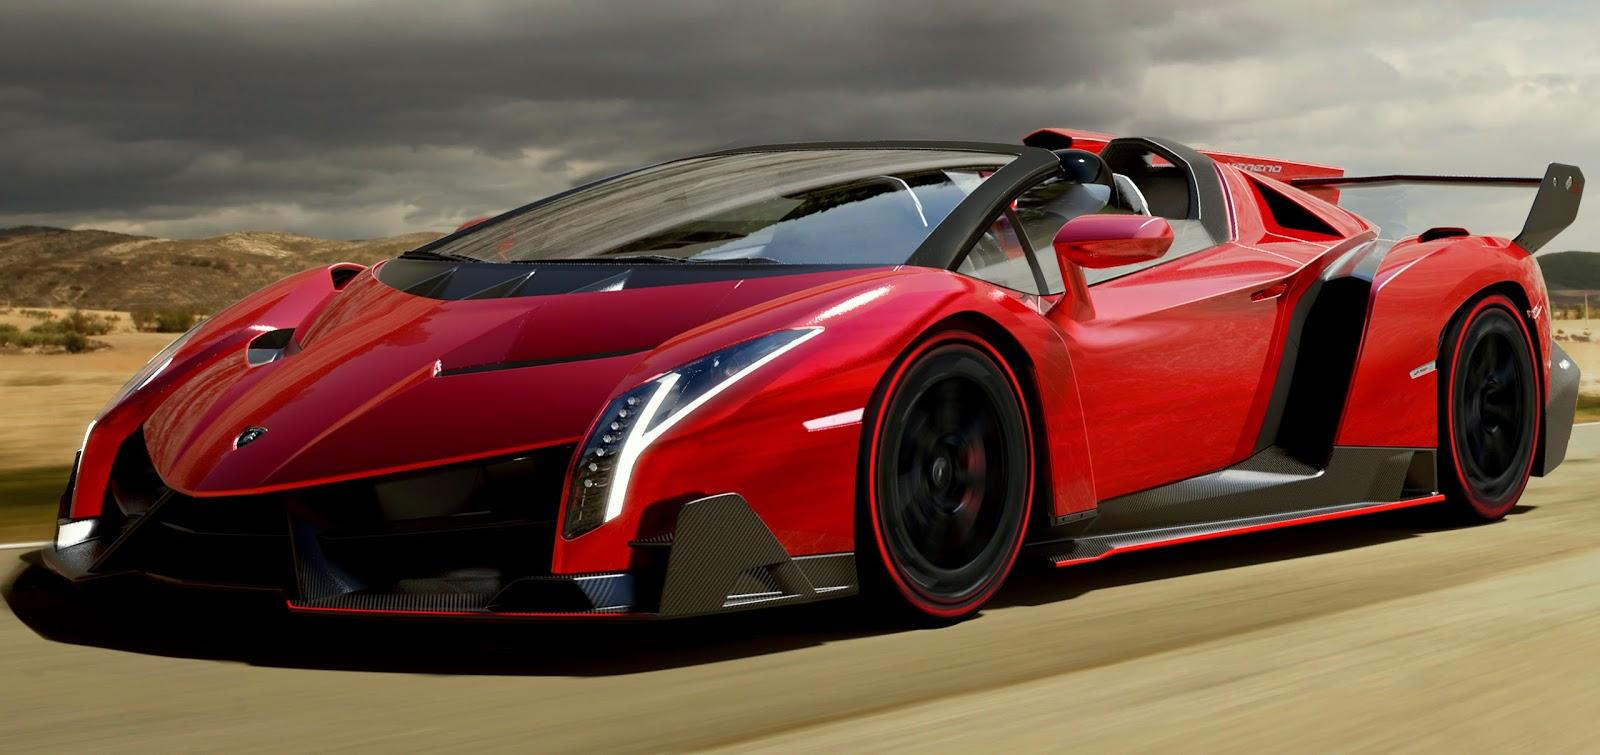 Spesifikasi Dan Keunggulan Lamborghini Veneno Roadster Spesifikasi